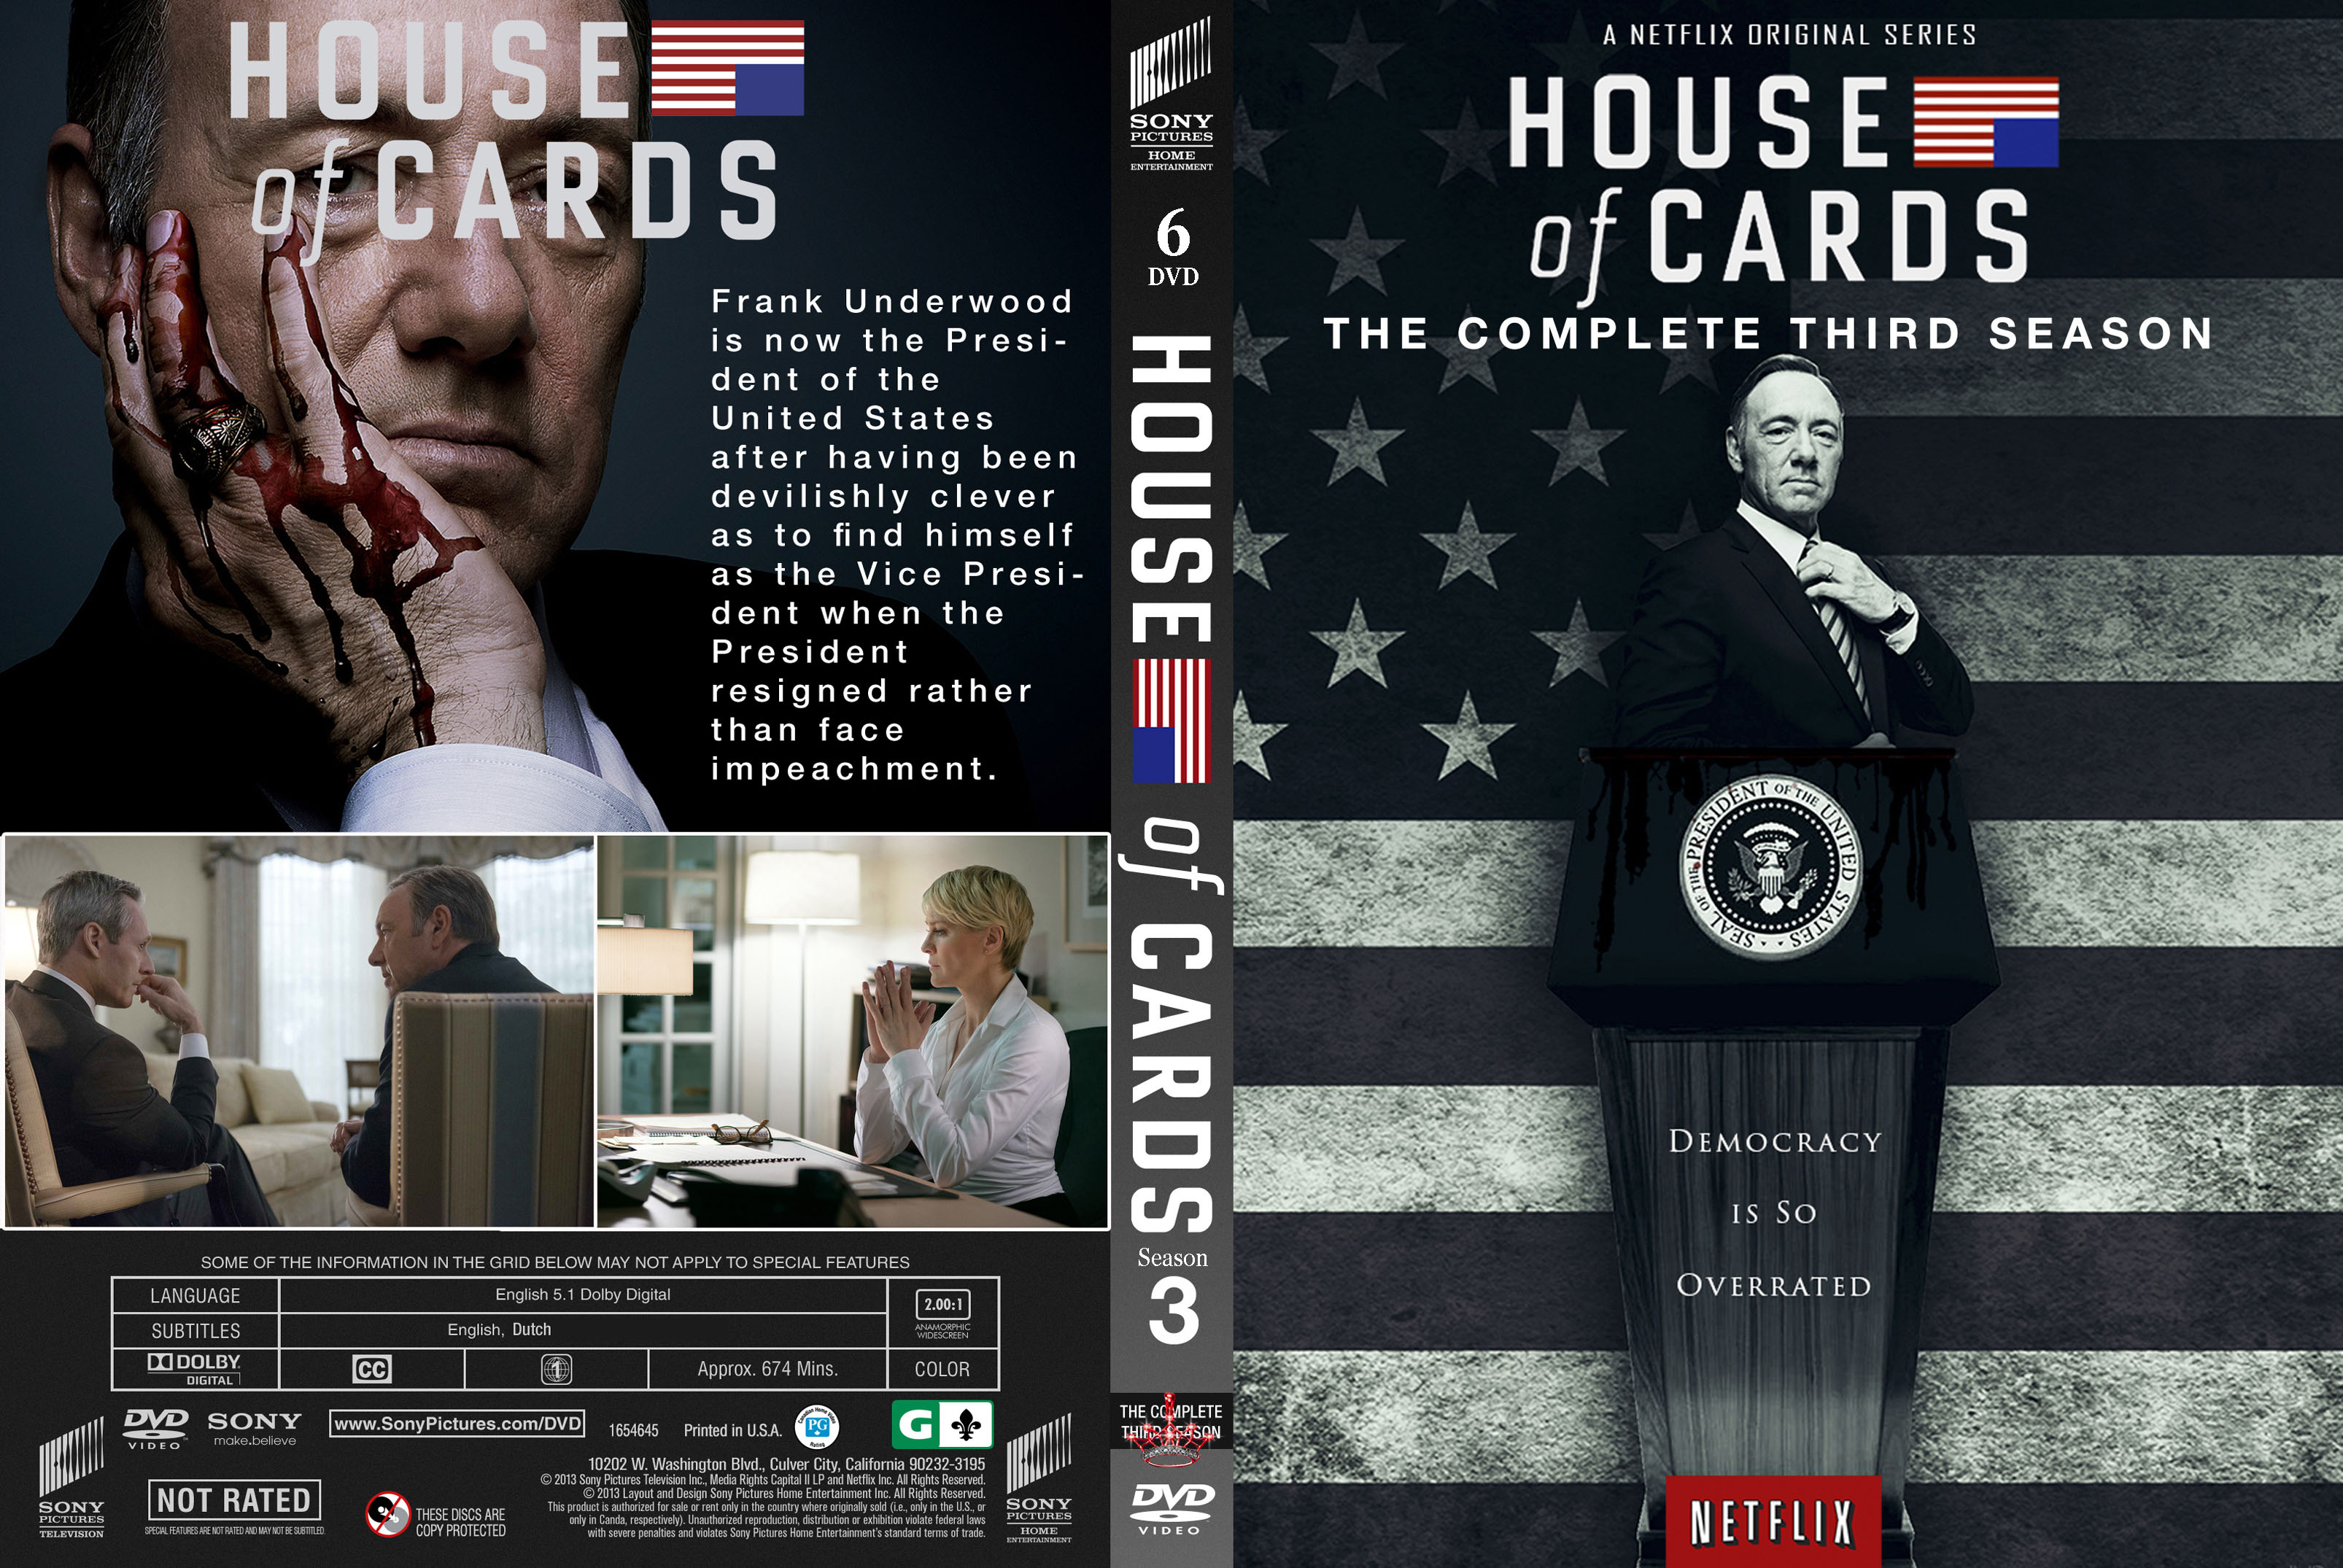 House of cards season 3 release date in Australia